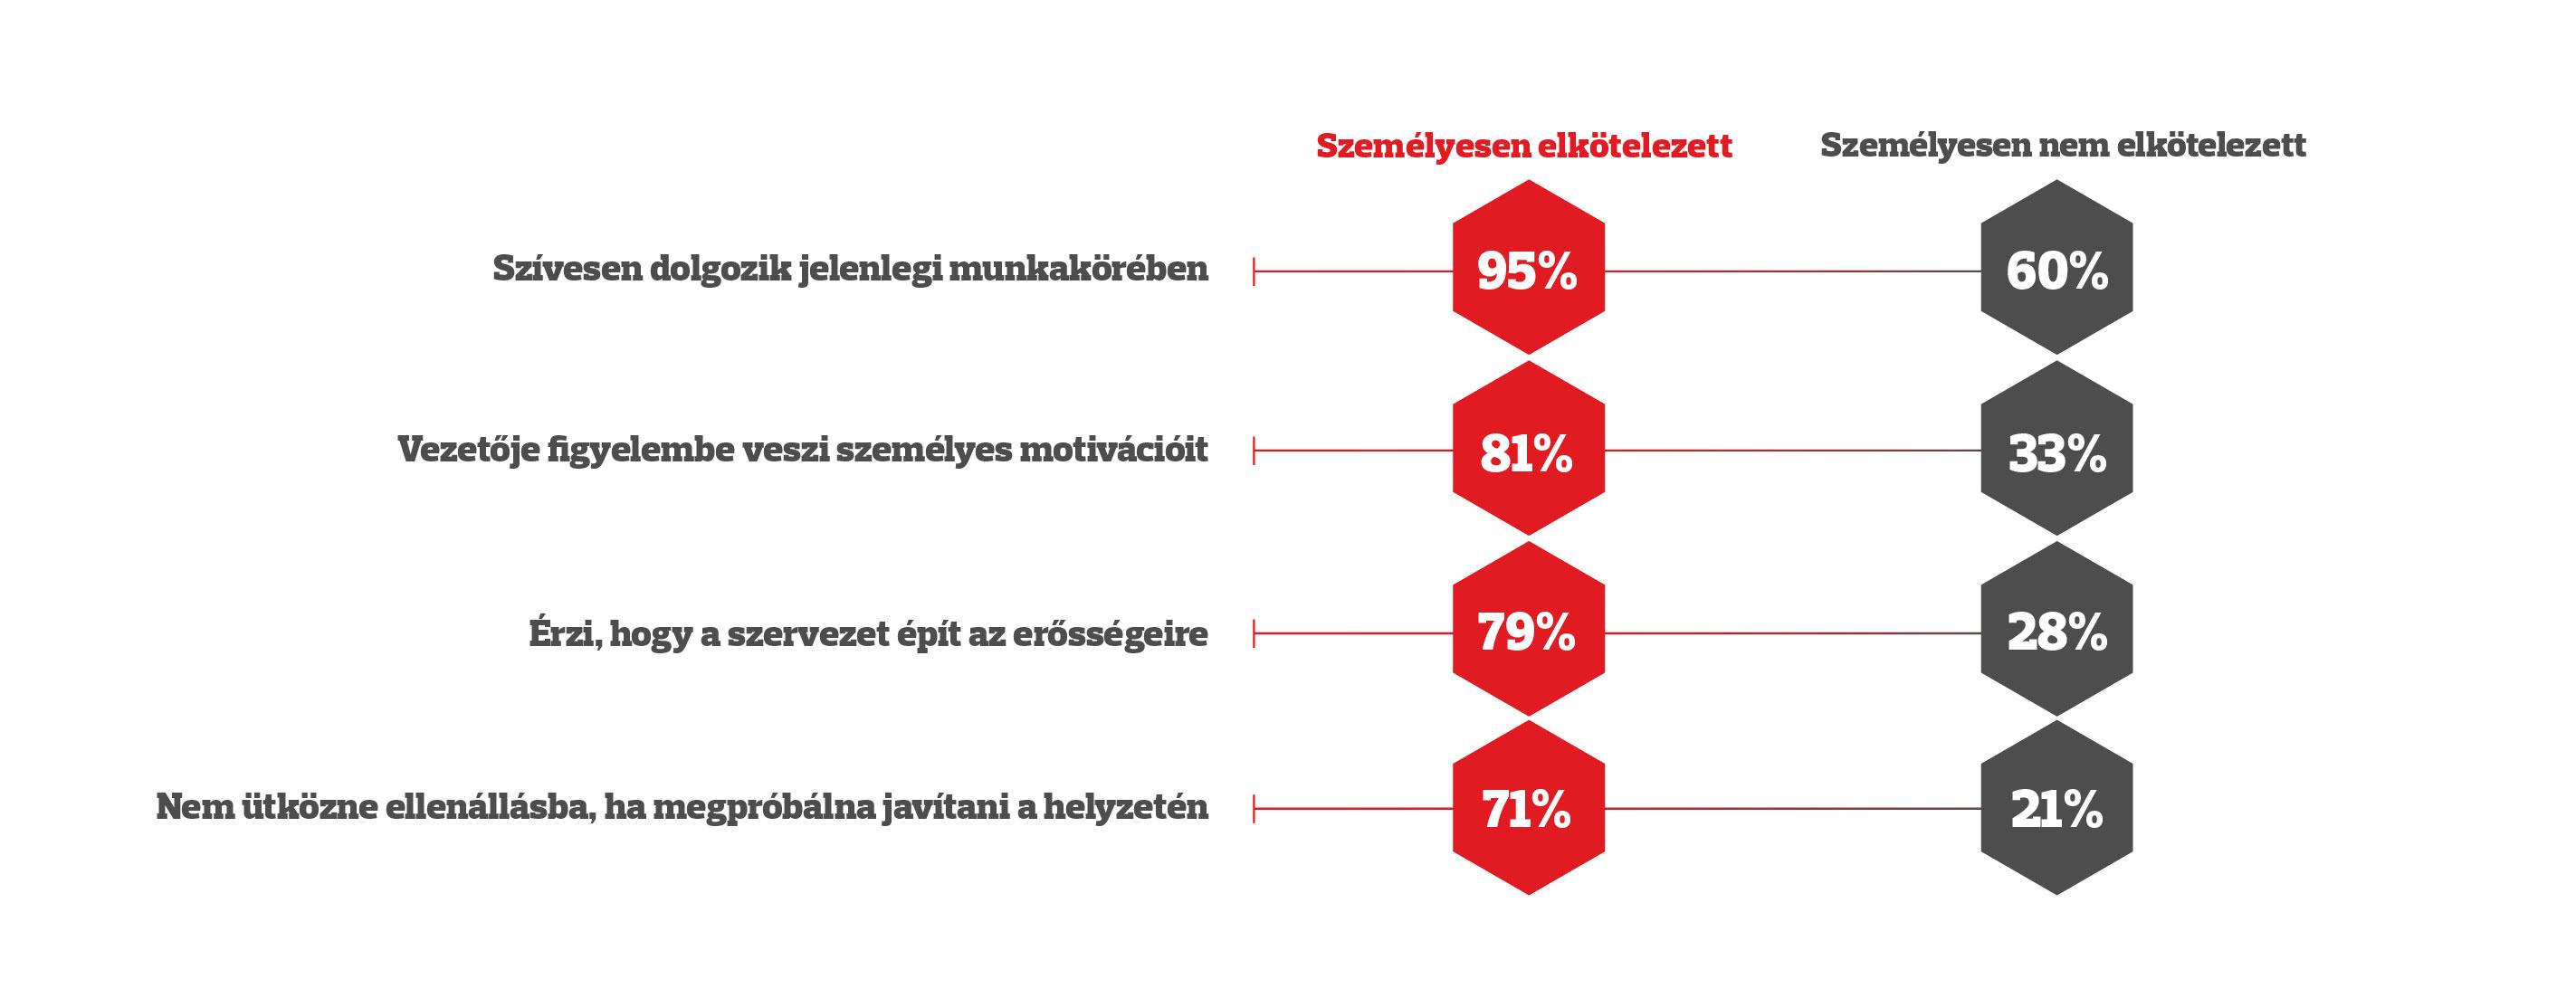 self_engagement_sajto_infografika-02_1.jpg